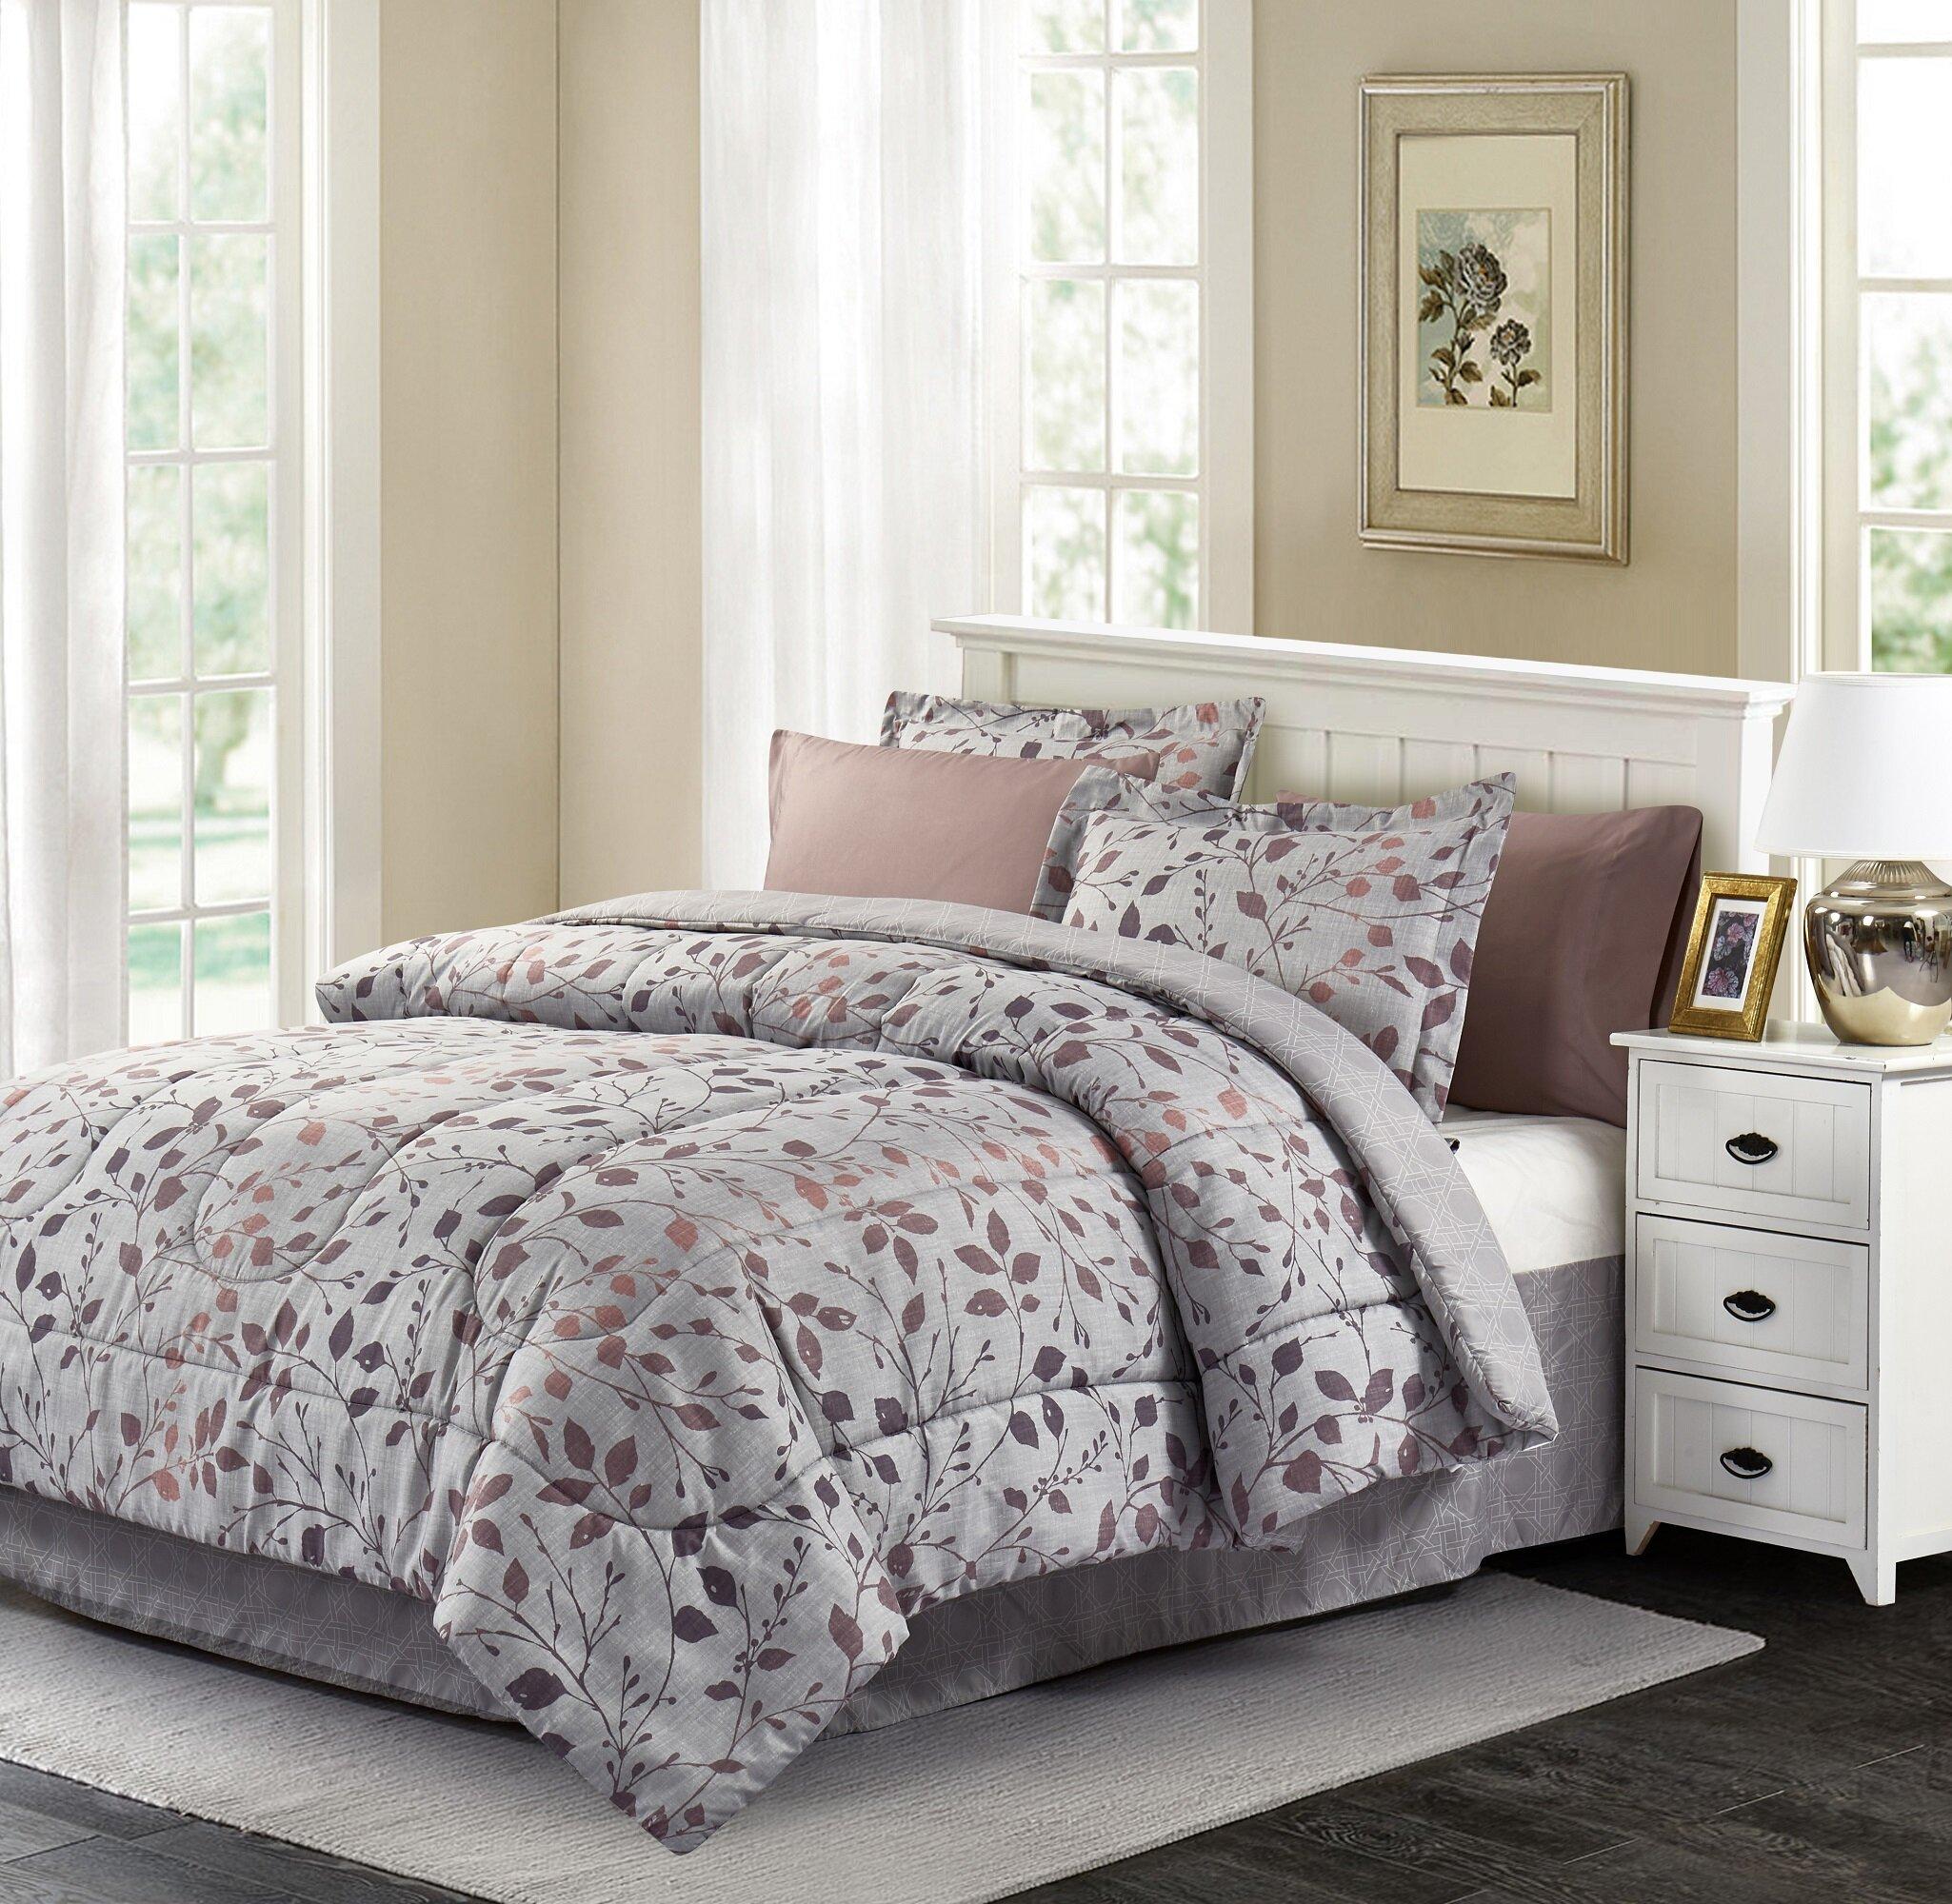 Charlton Home Bivins Reversible Comforter Set Reviews Wayfair